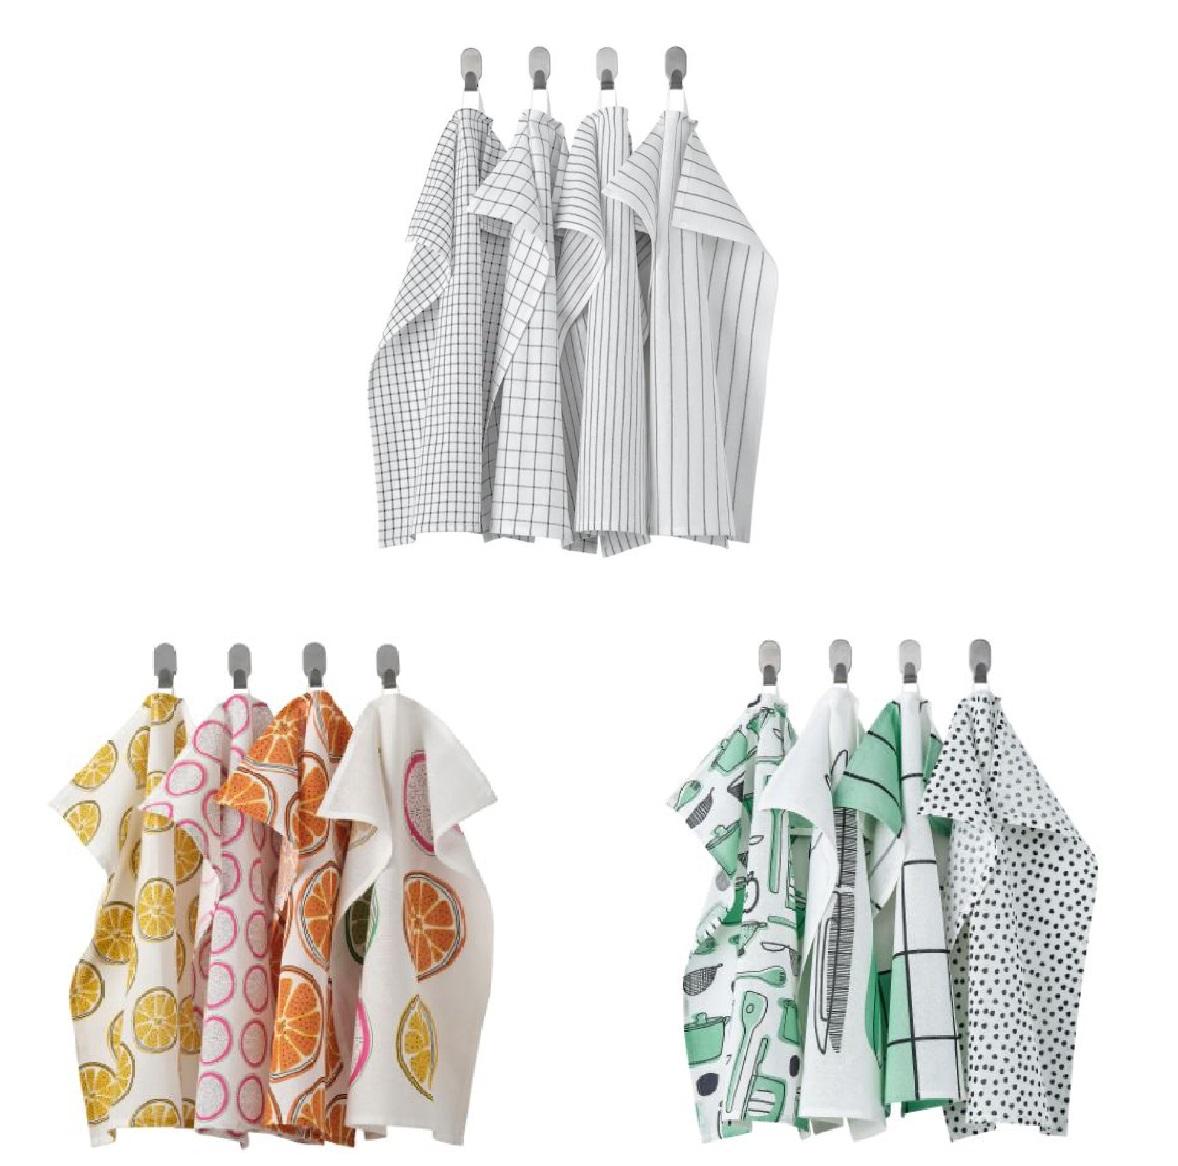 IKEA ファクトリーアウトレット イケア RINNIG リンニング キッチンクロス 先染めコットン つり下げループ付き 色落ちしにくい 大規模セール 4枚組 45x60cm